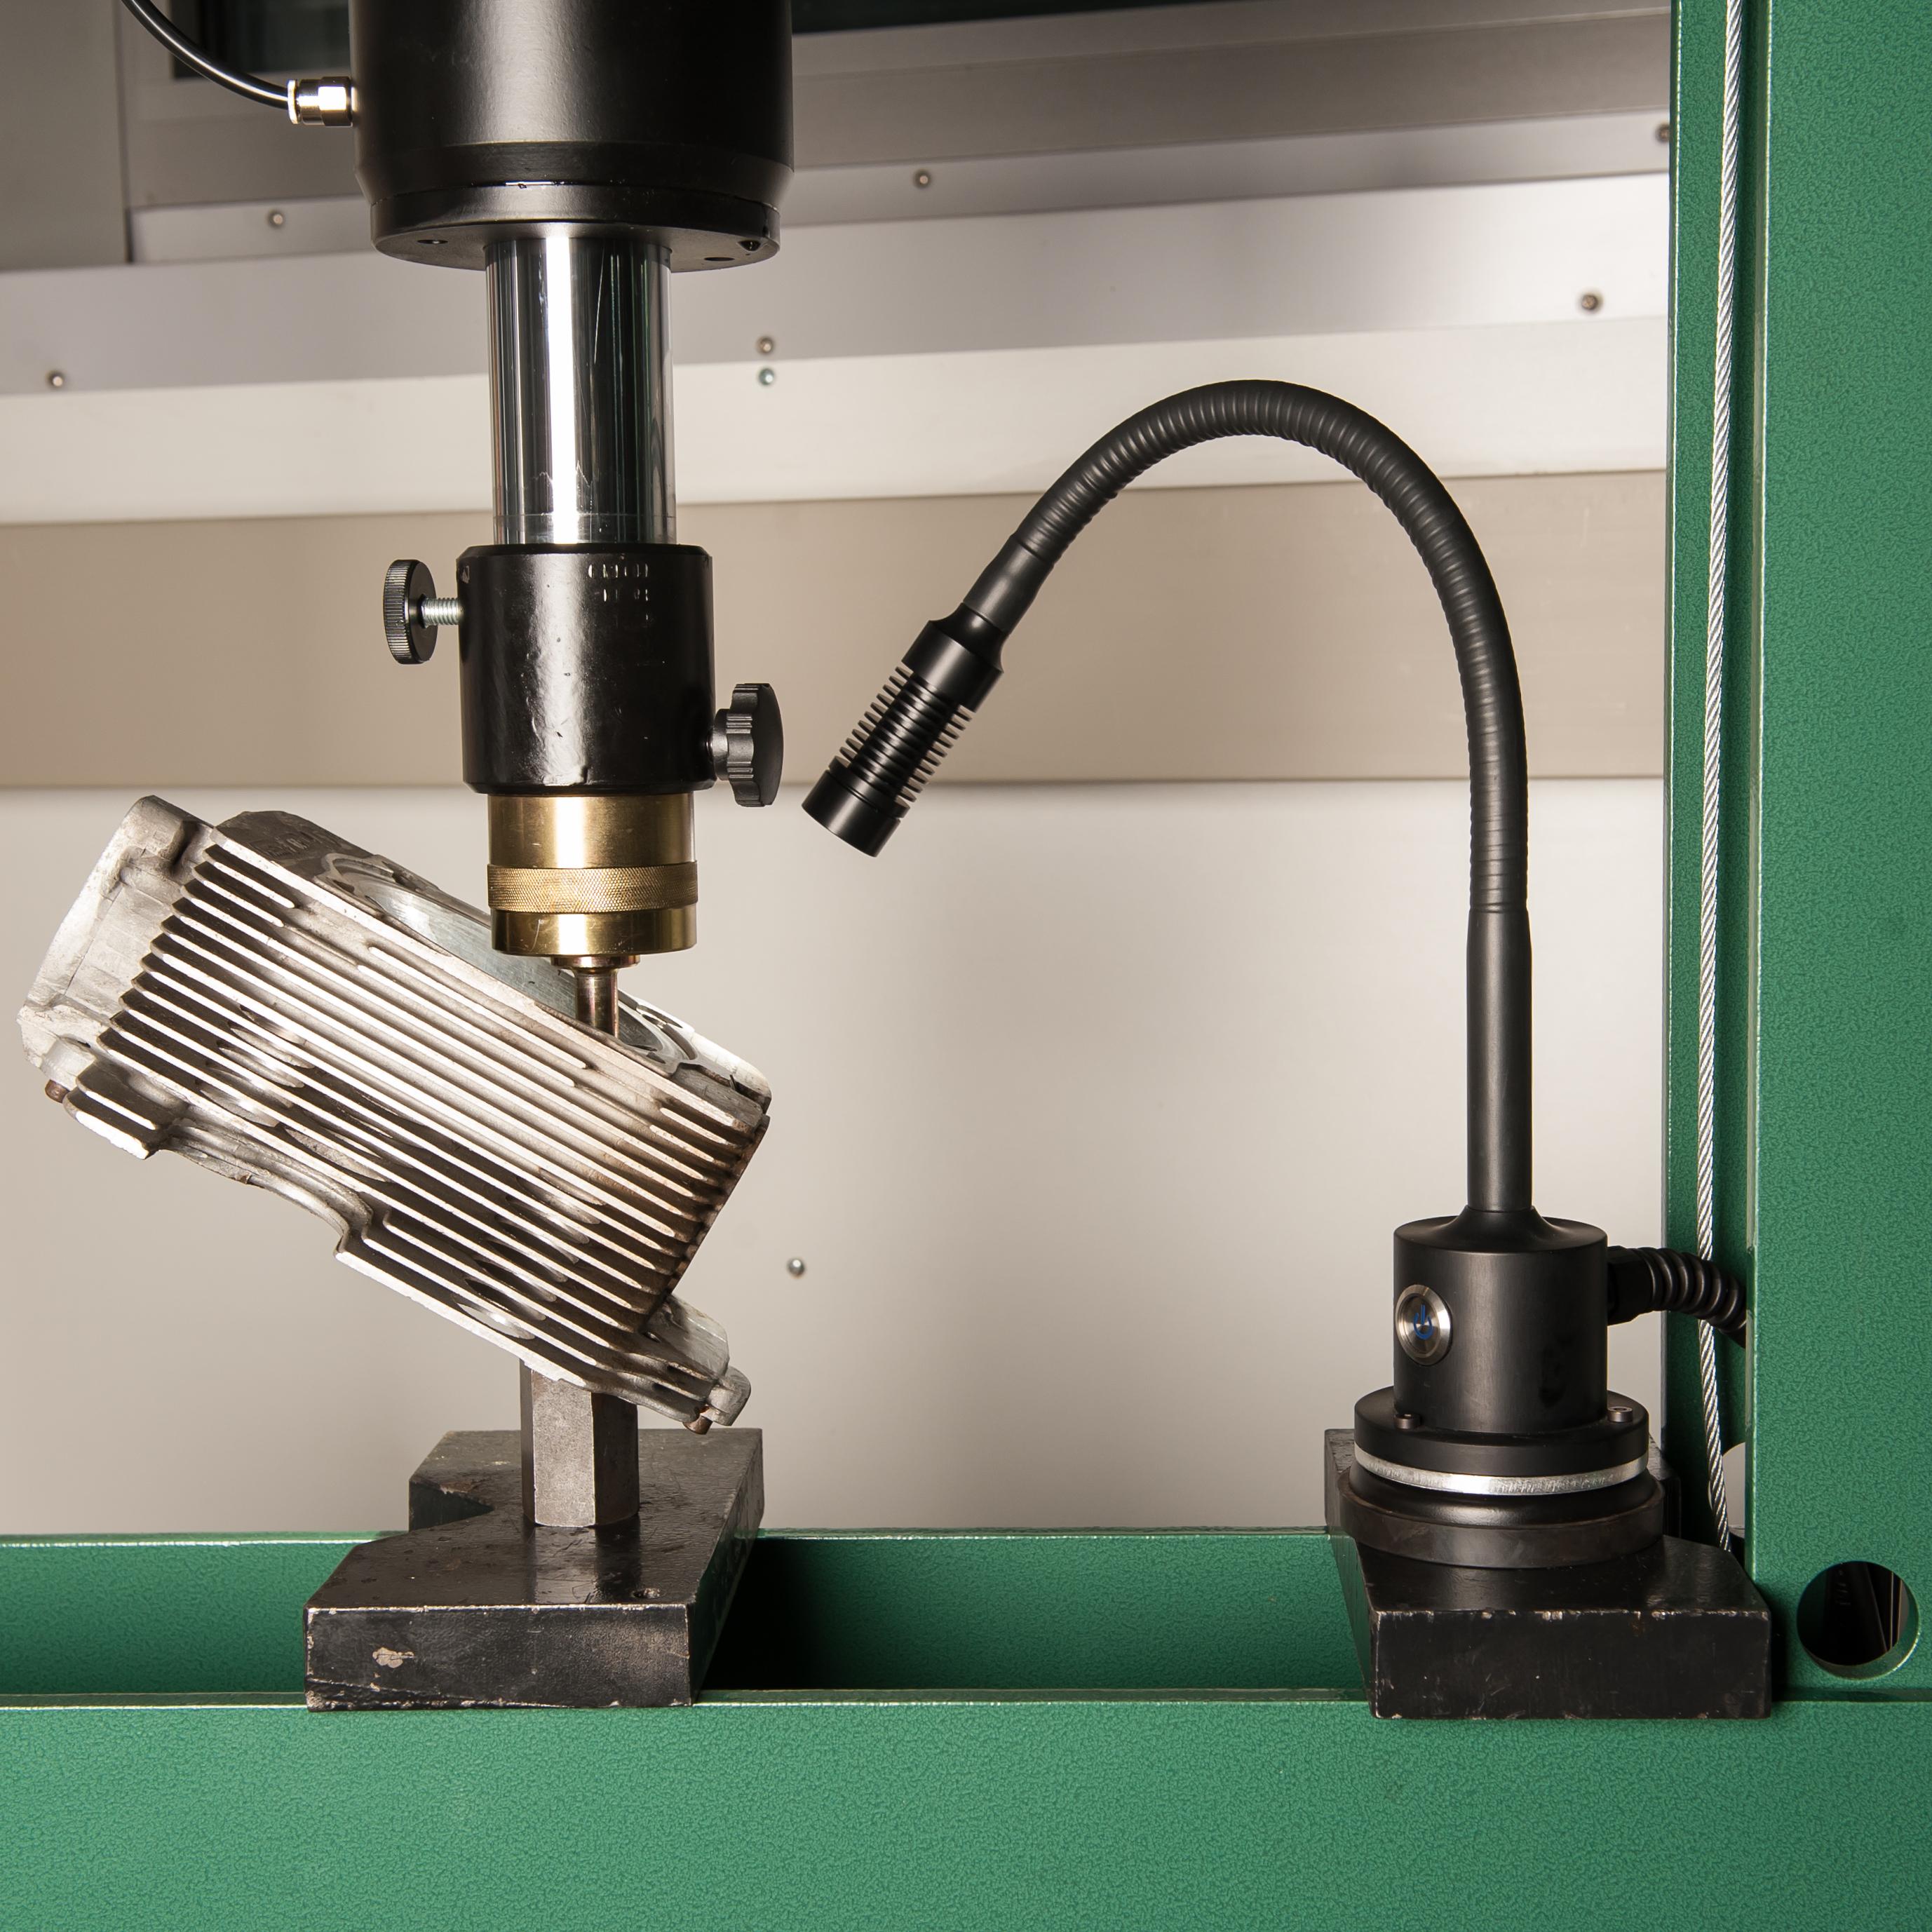 Serie 65: 40°/ Flex 500 mm/ Magnet/ 12-24 Volt DC